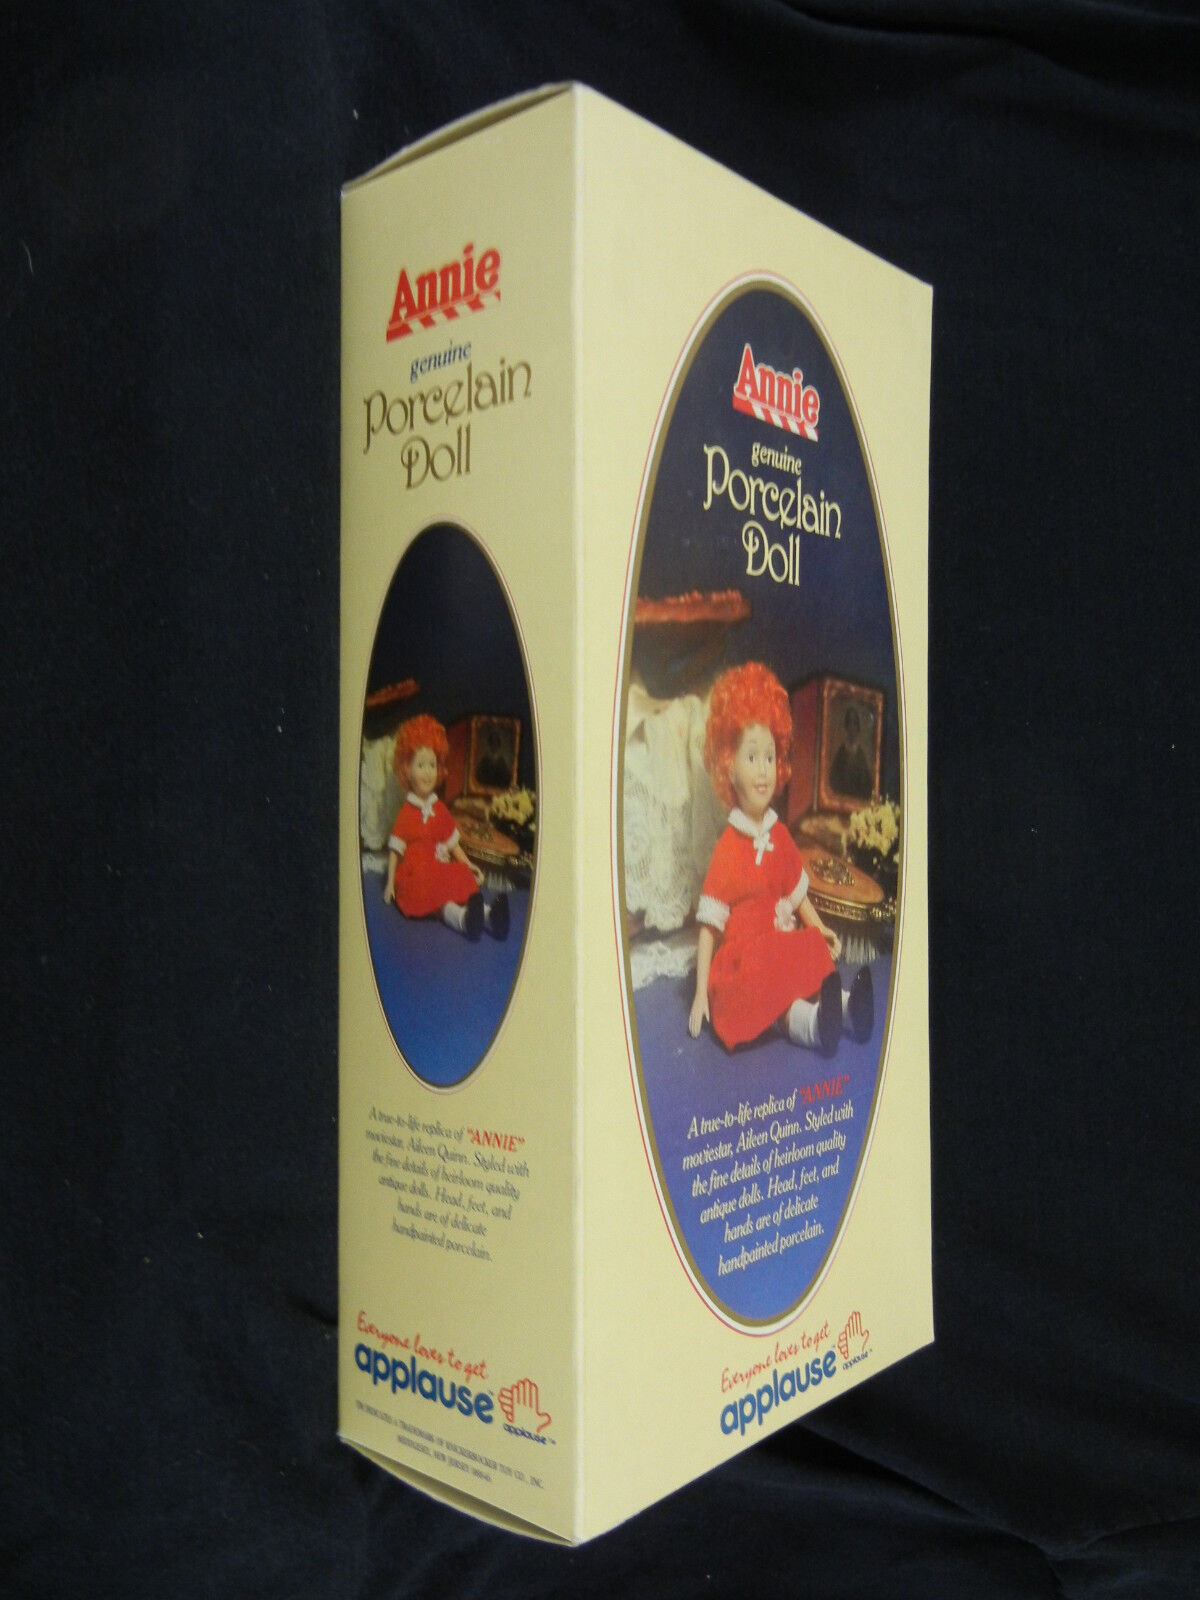 LITTLE ORPHAN ANNIE Porcelain Doll, Mint in Box : 1982 ANNIE Movie Promotion